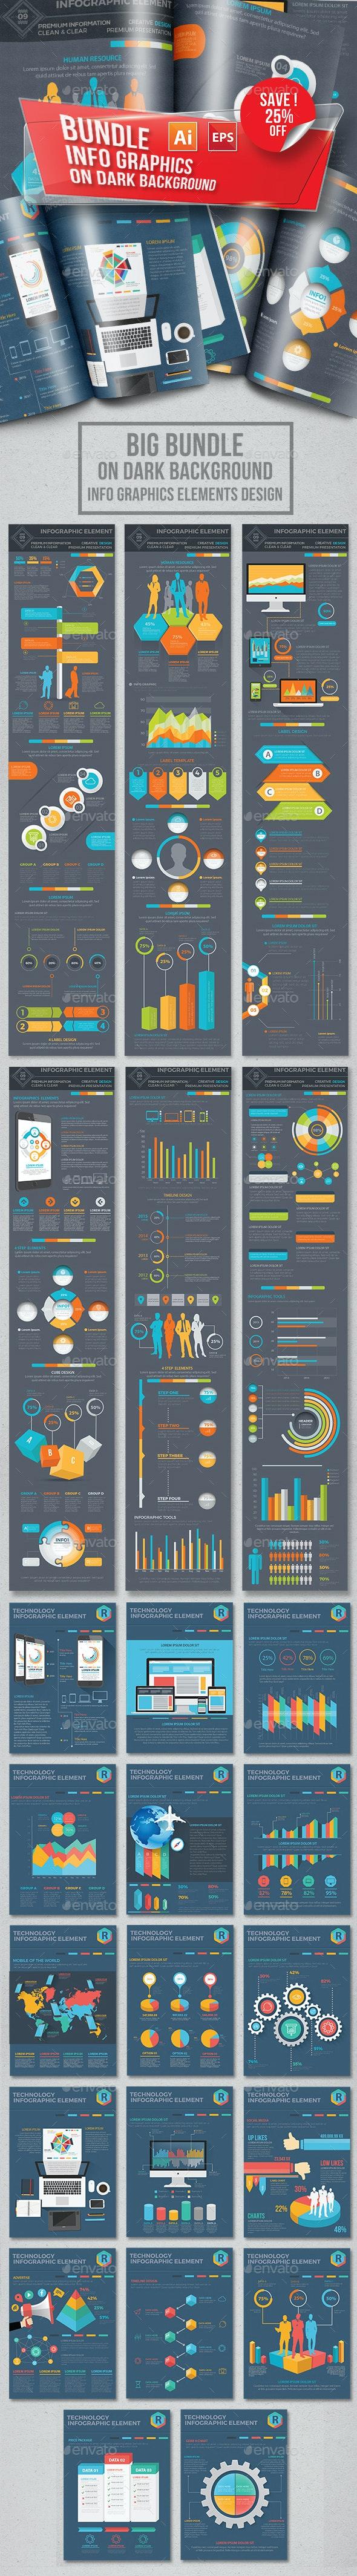 Bundle Infographic on dark background - Infographics